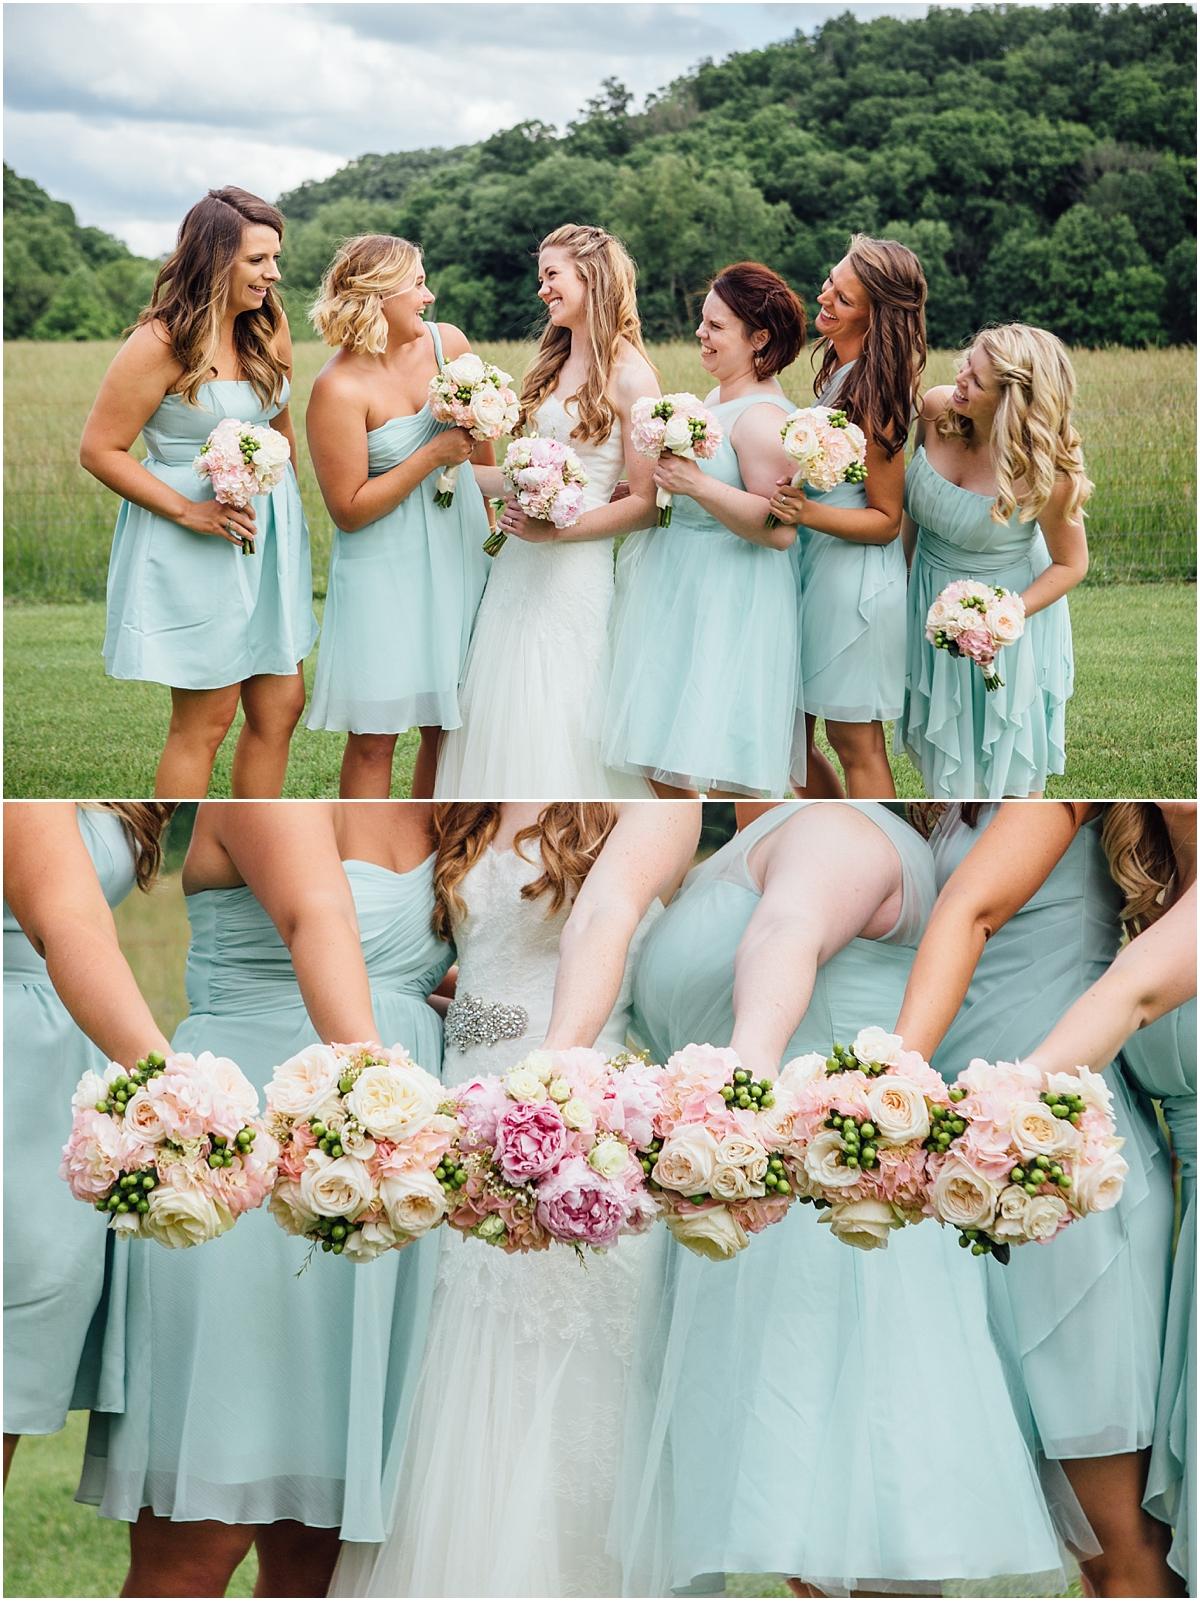 rogersville-tennessee-wedding-photographer-katy-sergent-east-tn-photographer-garden-mint_0058.jpg